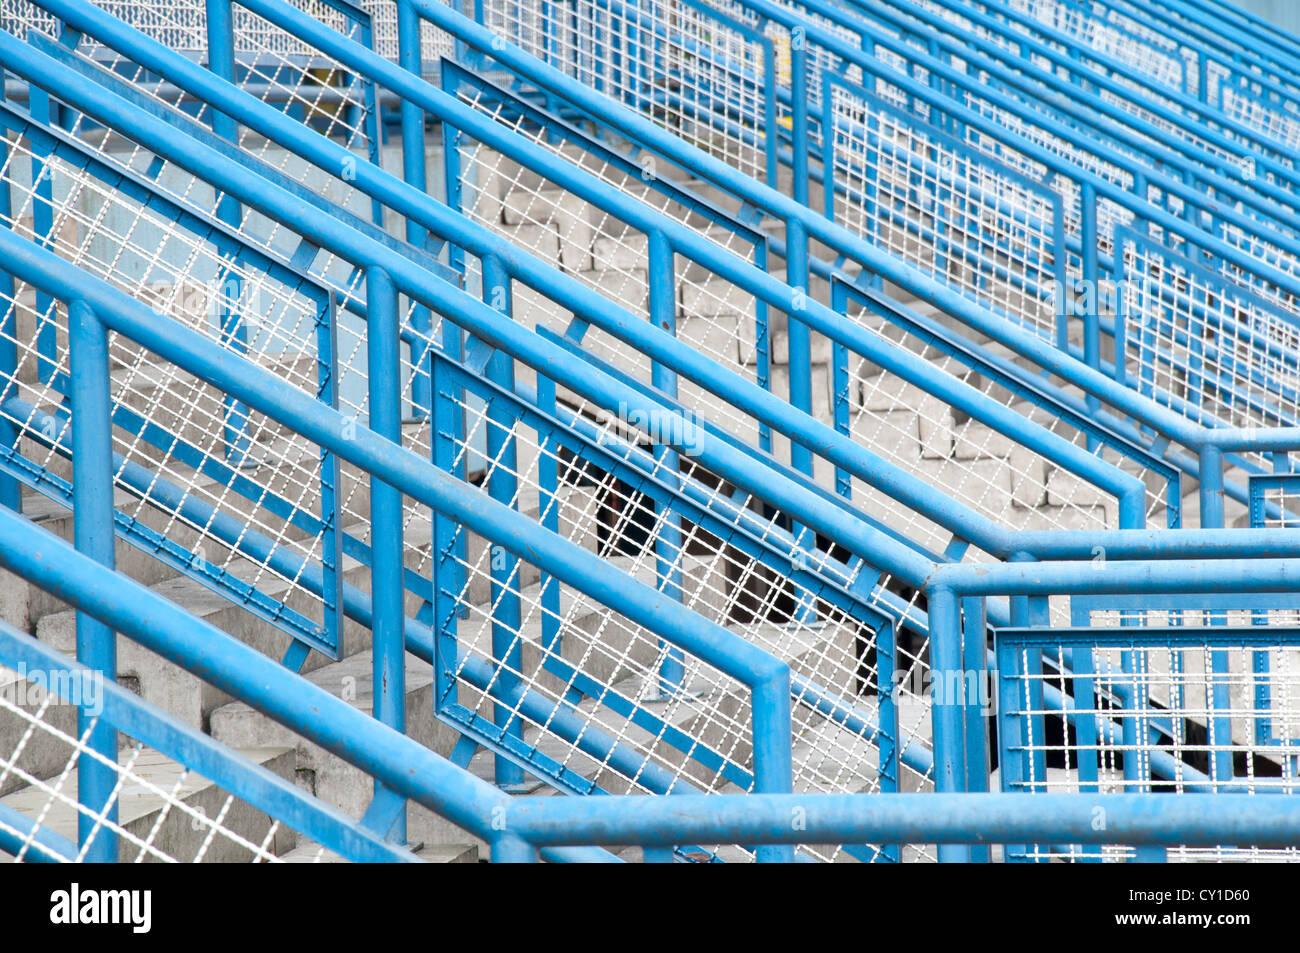 Wire Shapes Stockfotos & Wire Shapes Bilder - Seite 2 - Alamy